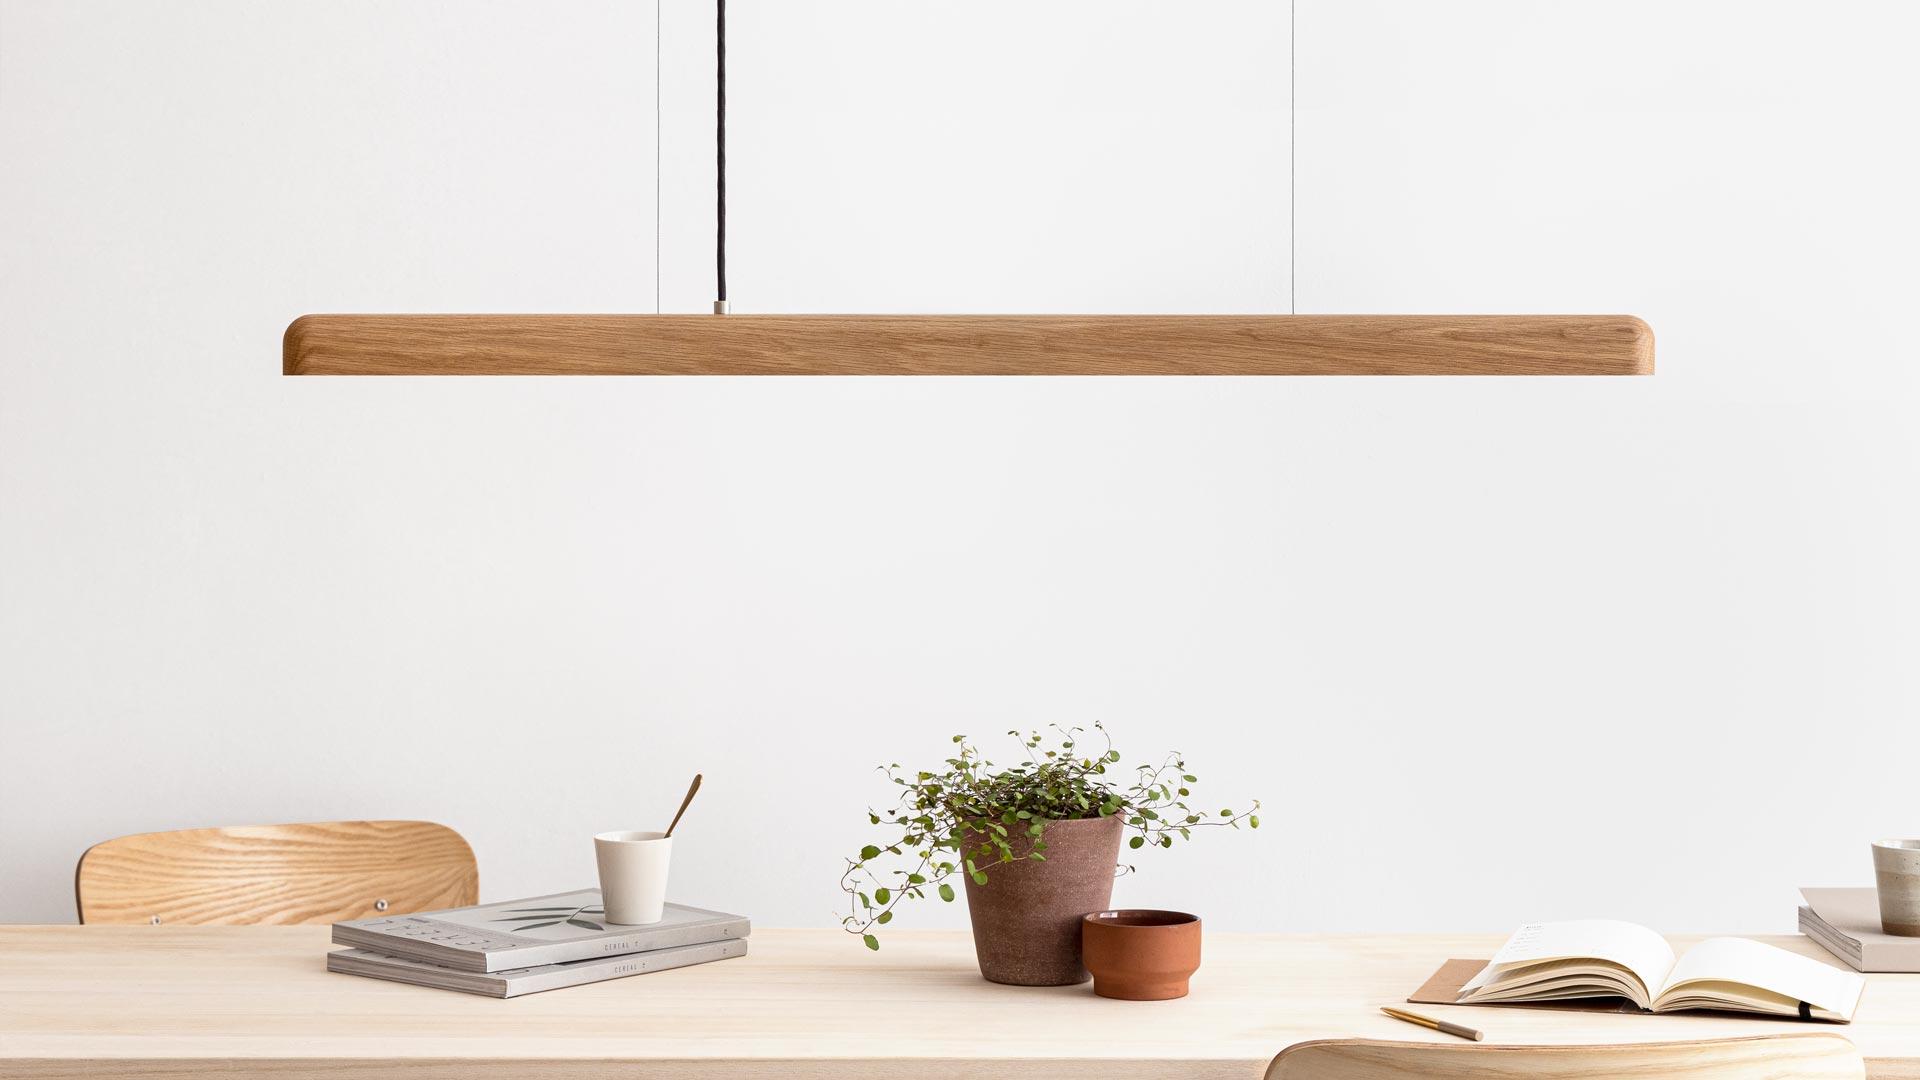 LED Pendelleuchte Holz dimmbar